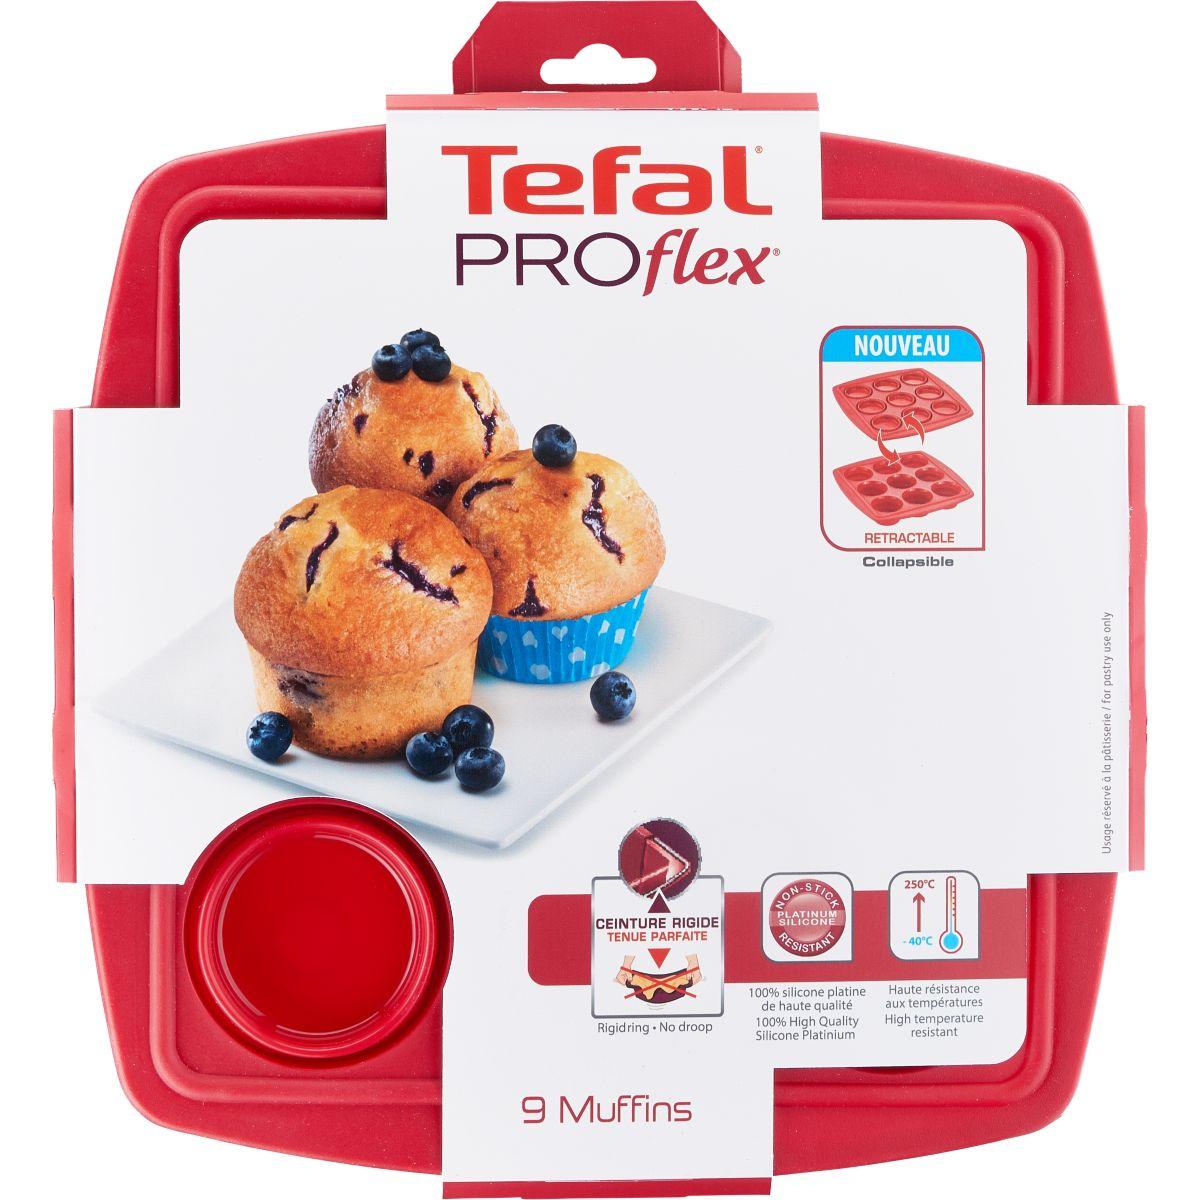 Moule en silicone tefal proflex r�tractable 9 muffins (photo)